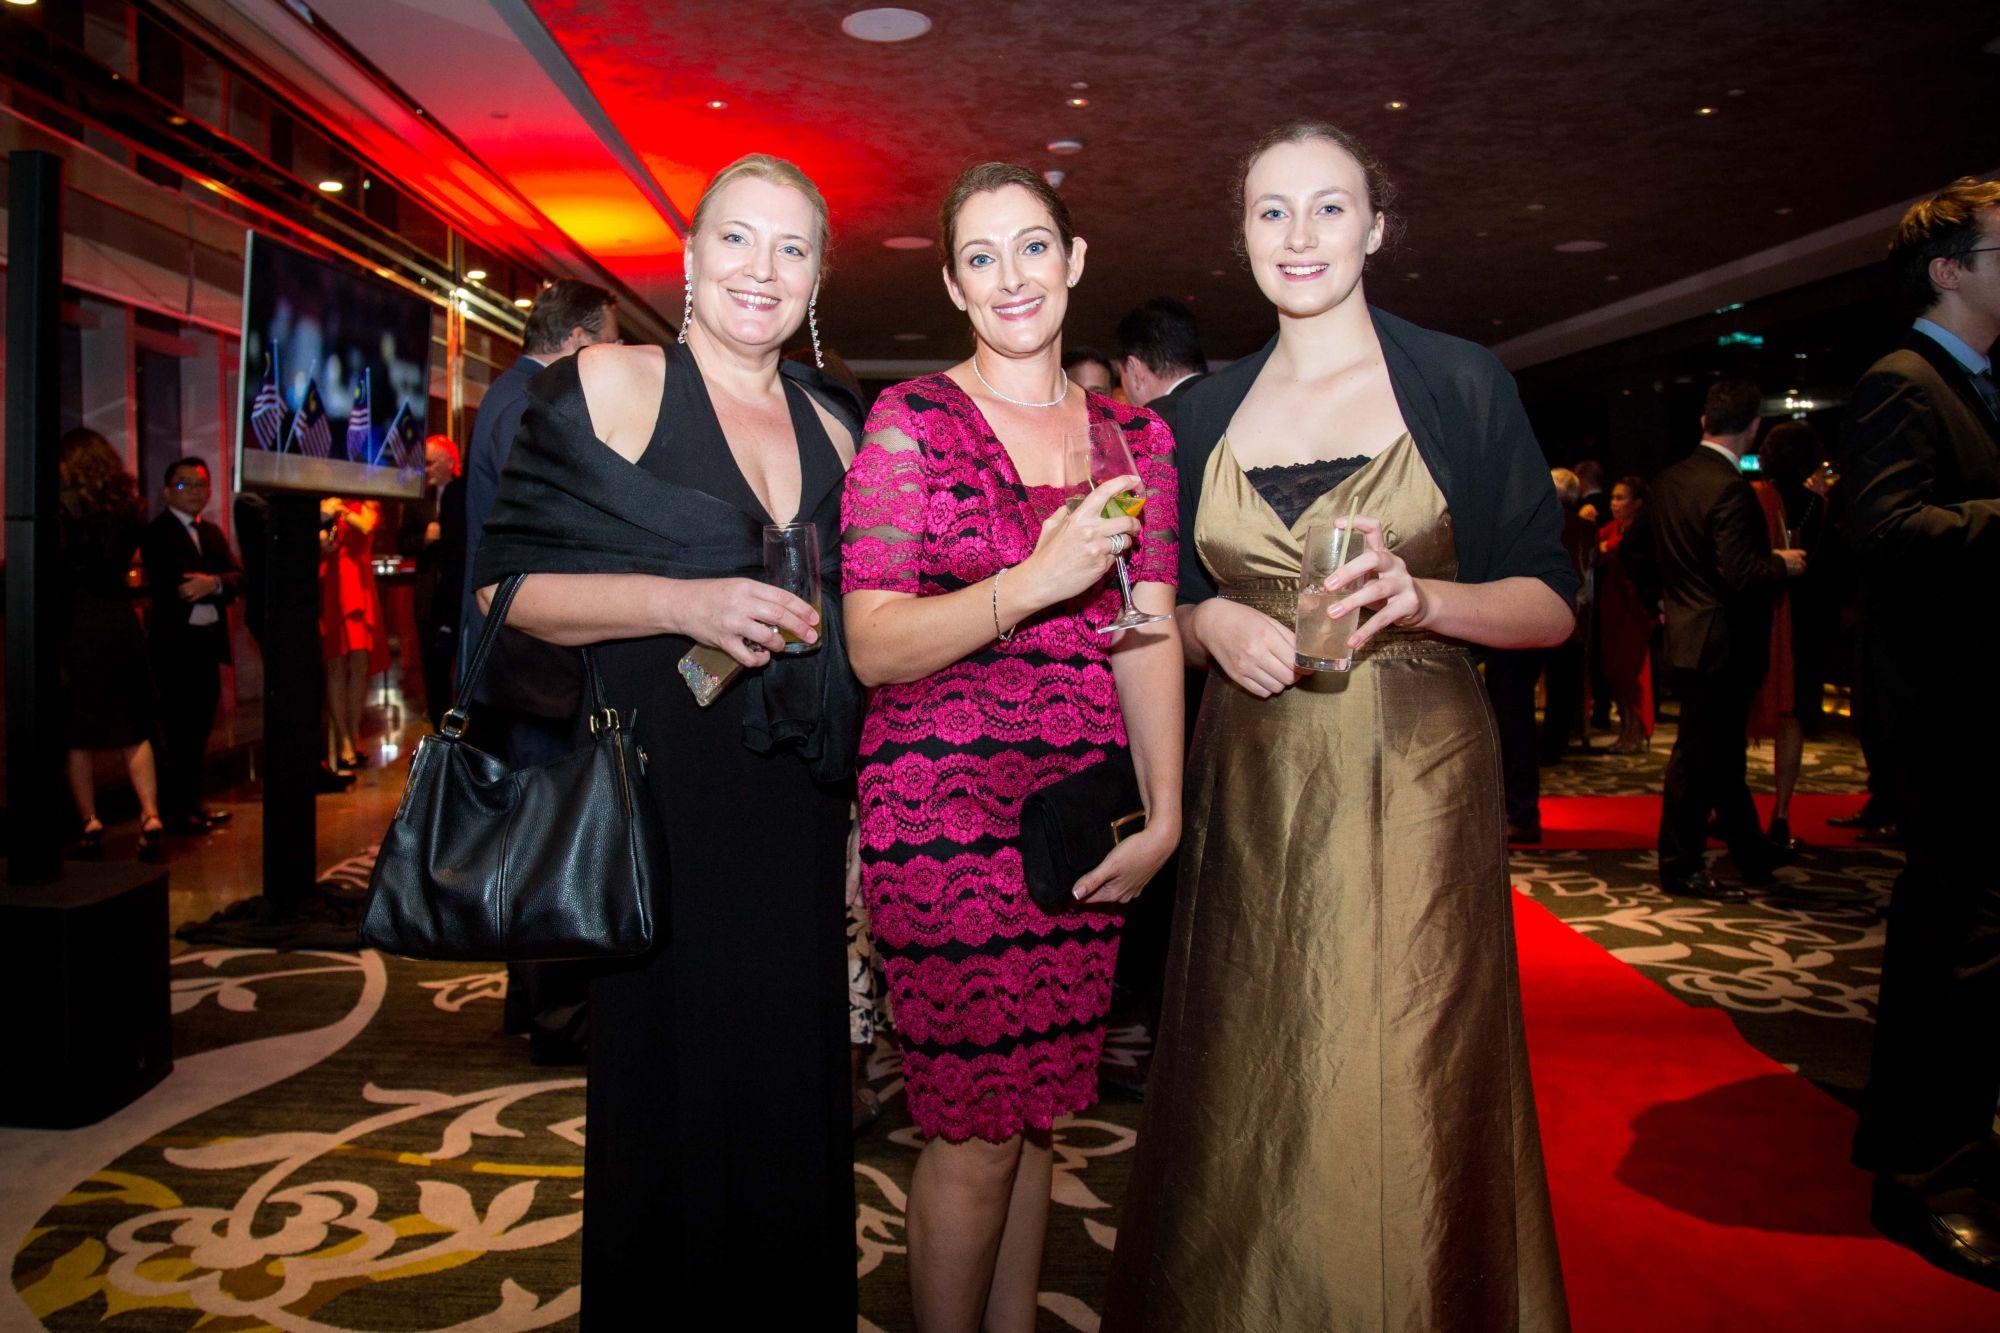 Delphinne Buriot, Theresa Attar and Laurene Buriot